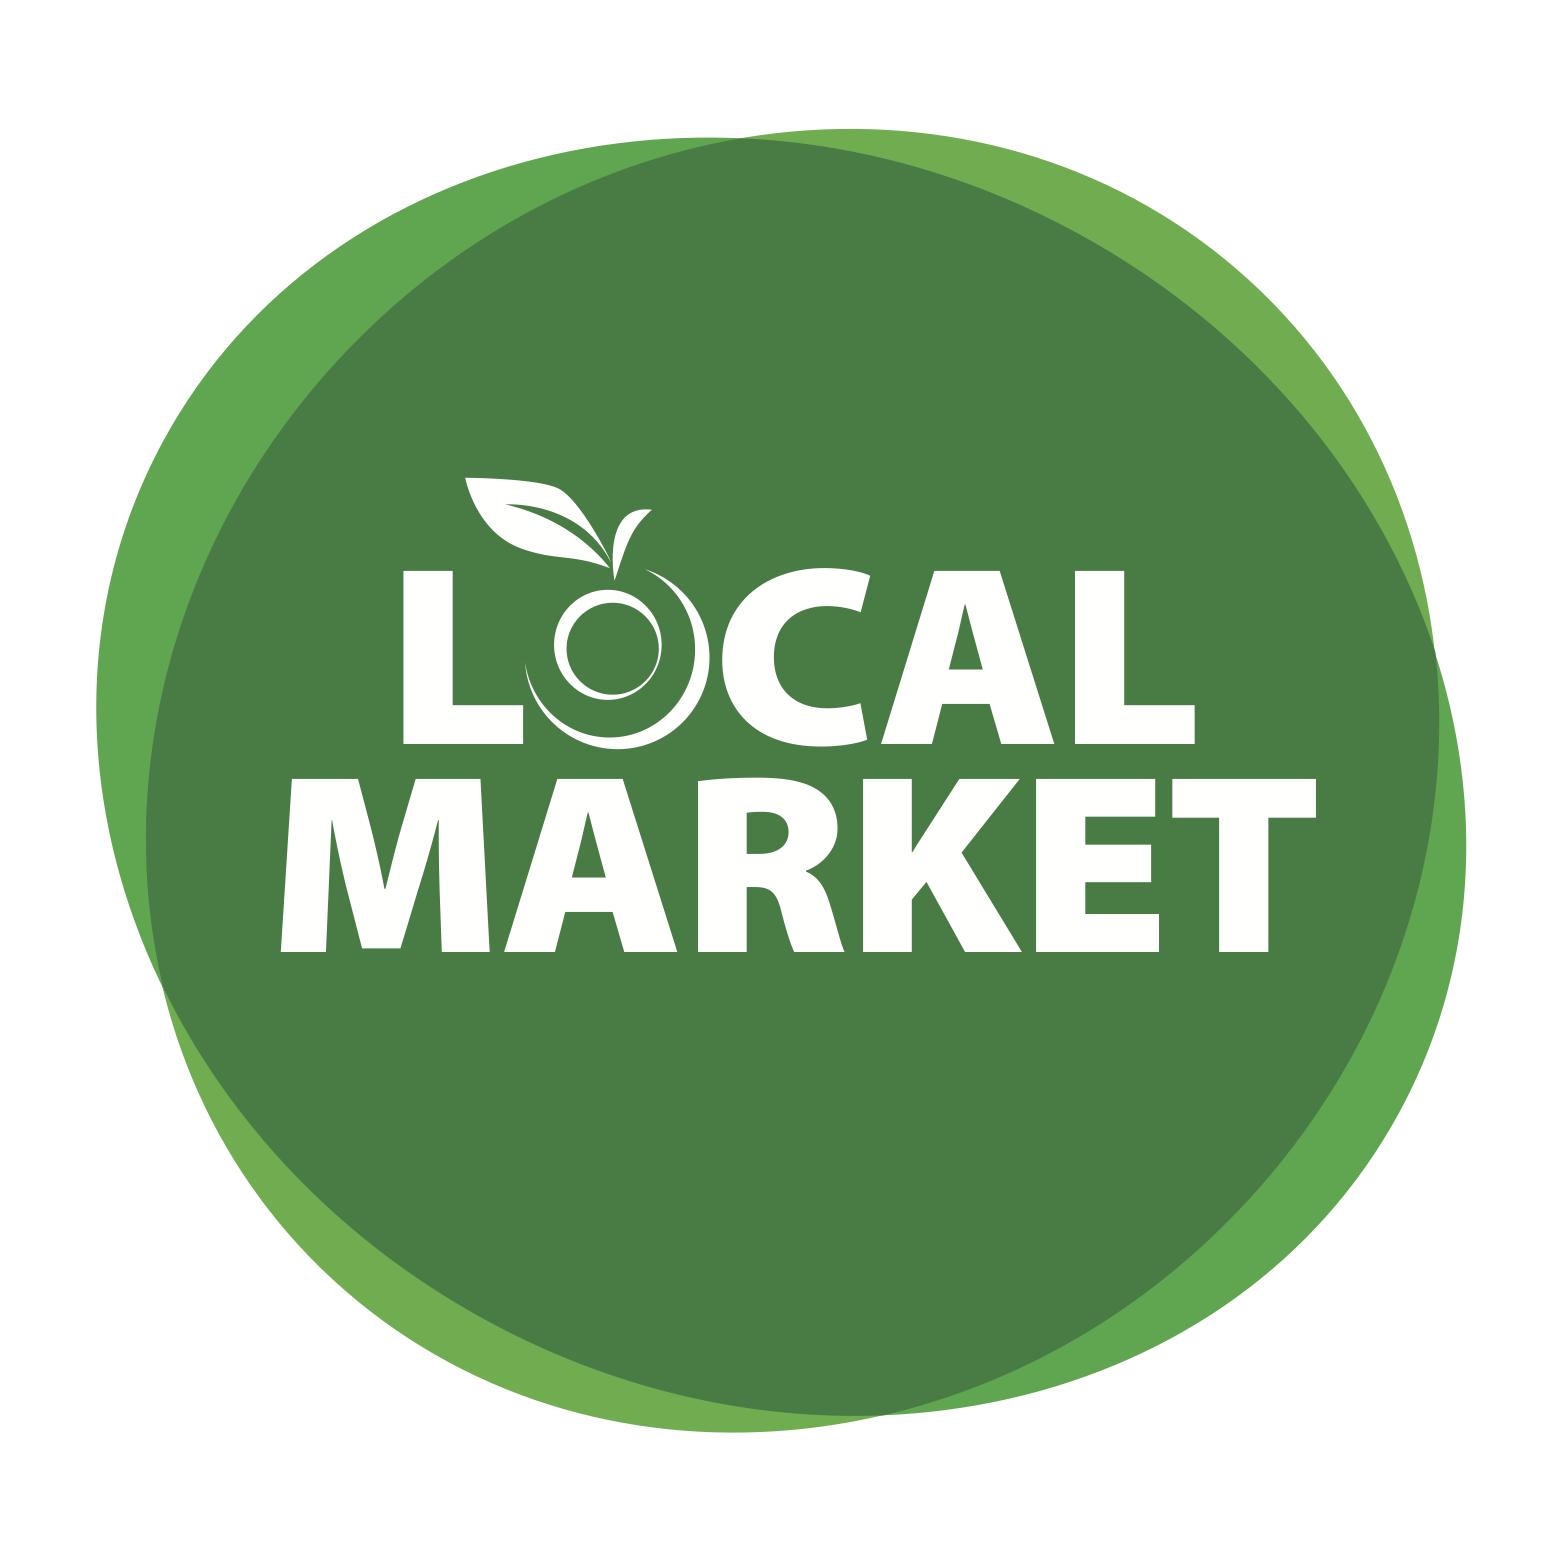 Local Market logo